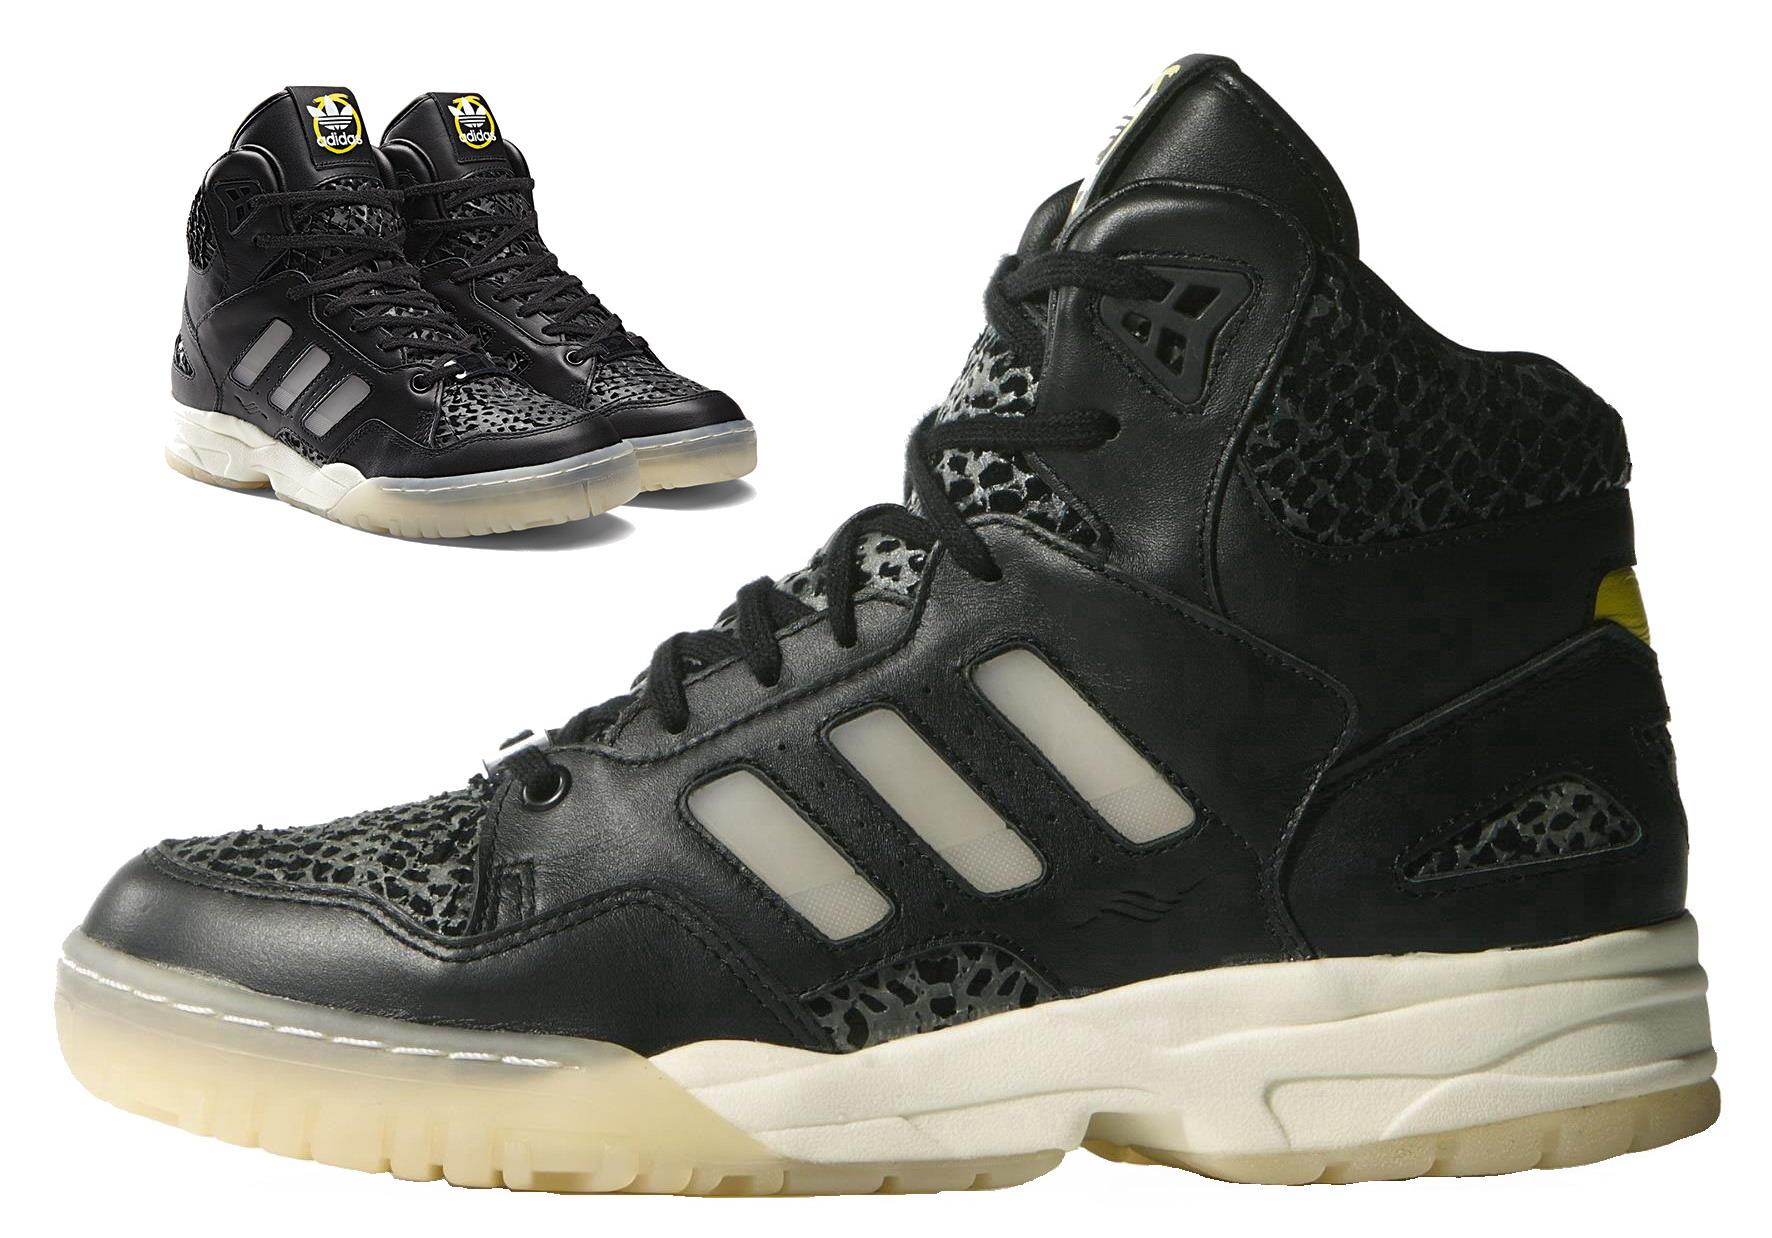 size 40 a43c9 bca27 Adidas Rita Ora Bankshot buty damskie - 37 13